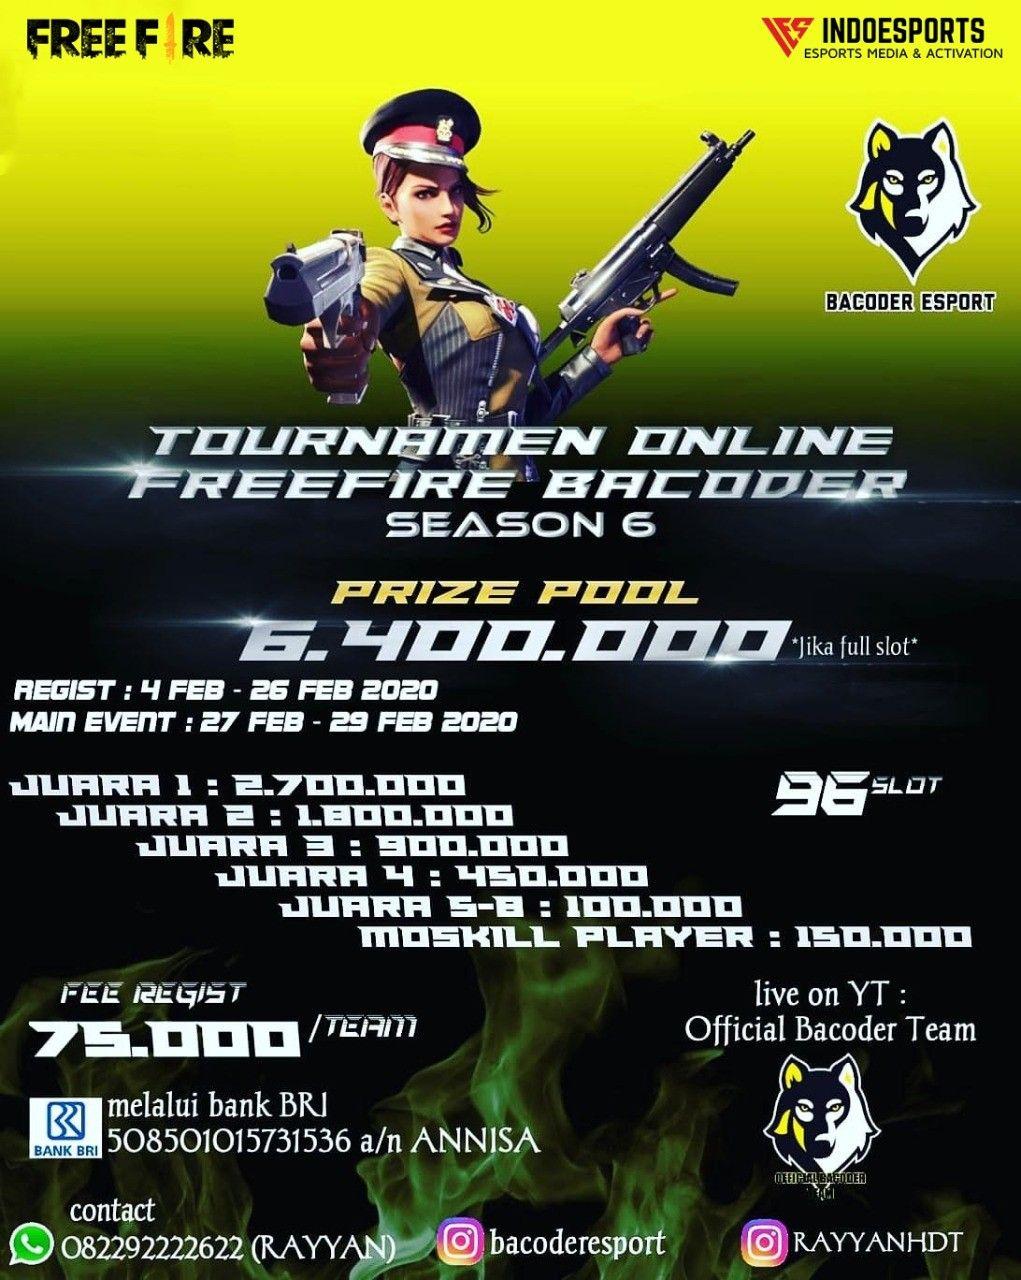 Tournament Online Free Fire Barcoder Season 6 Tanggal Hadiah Media Sosial